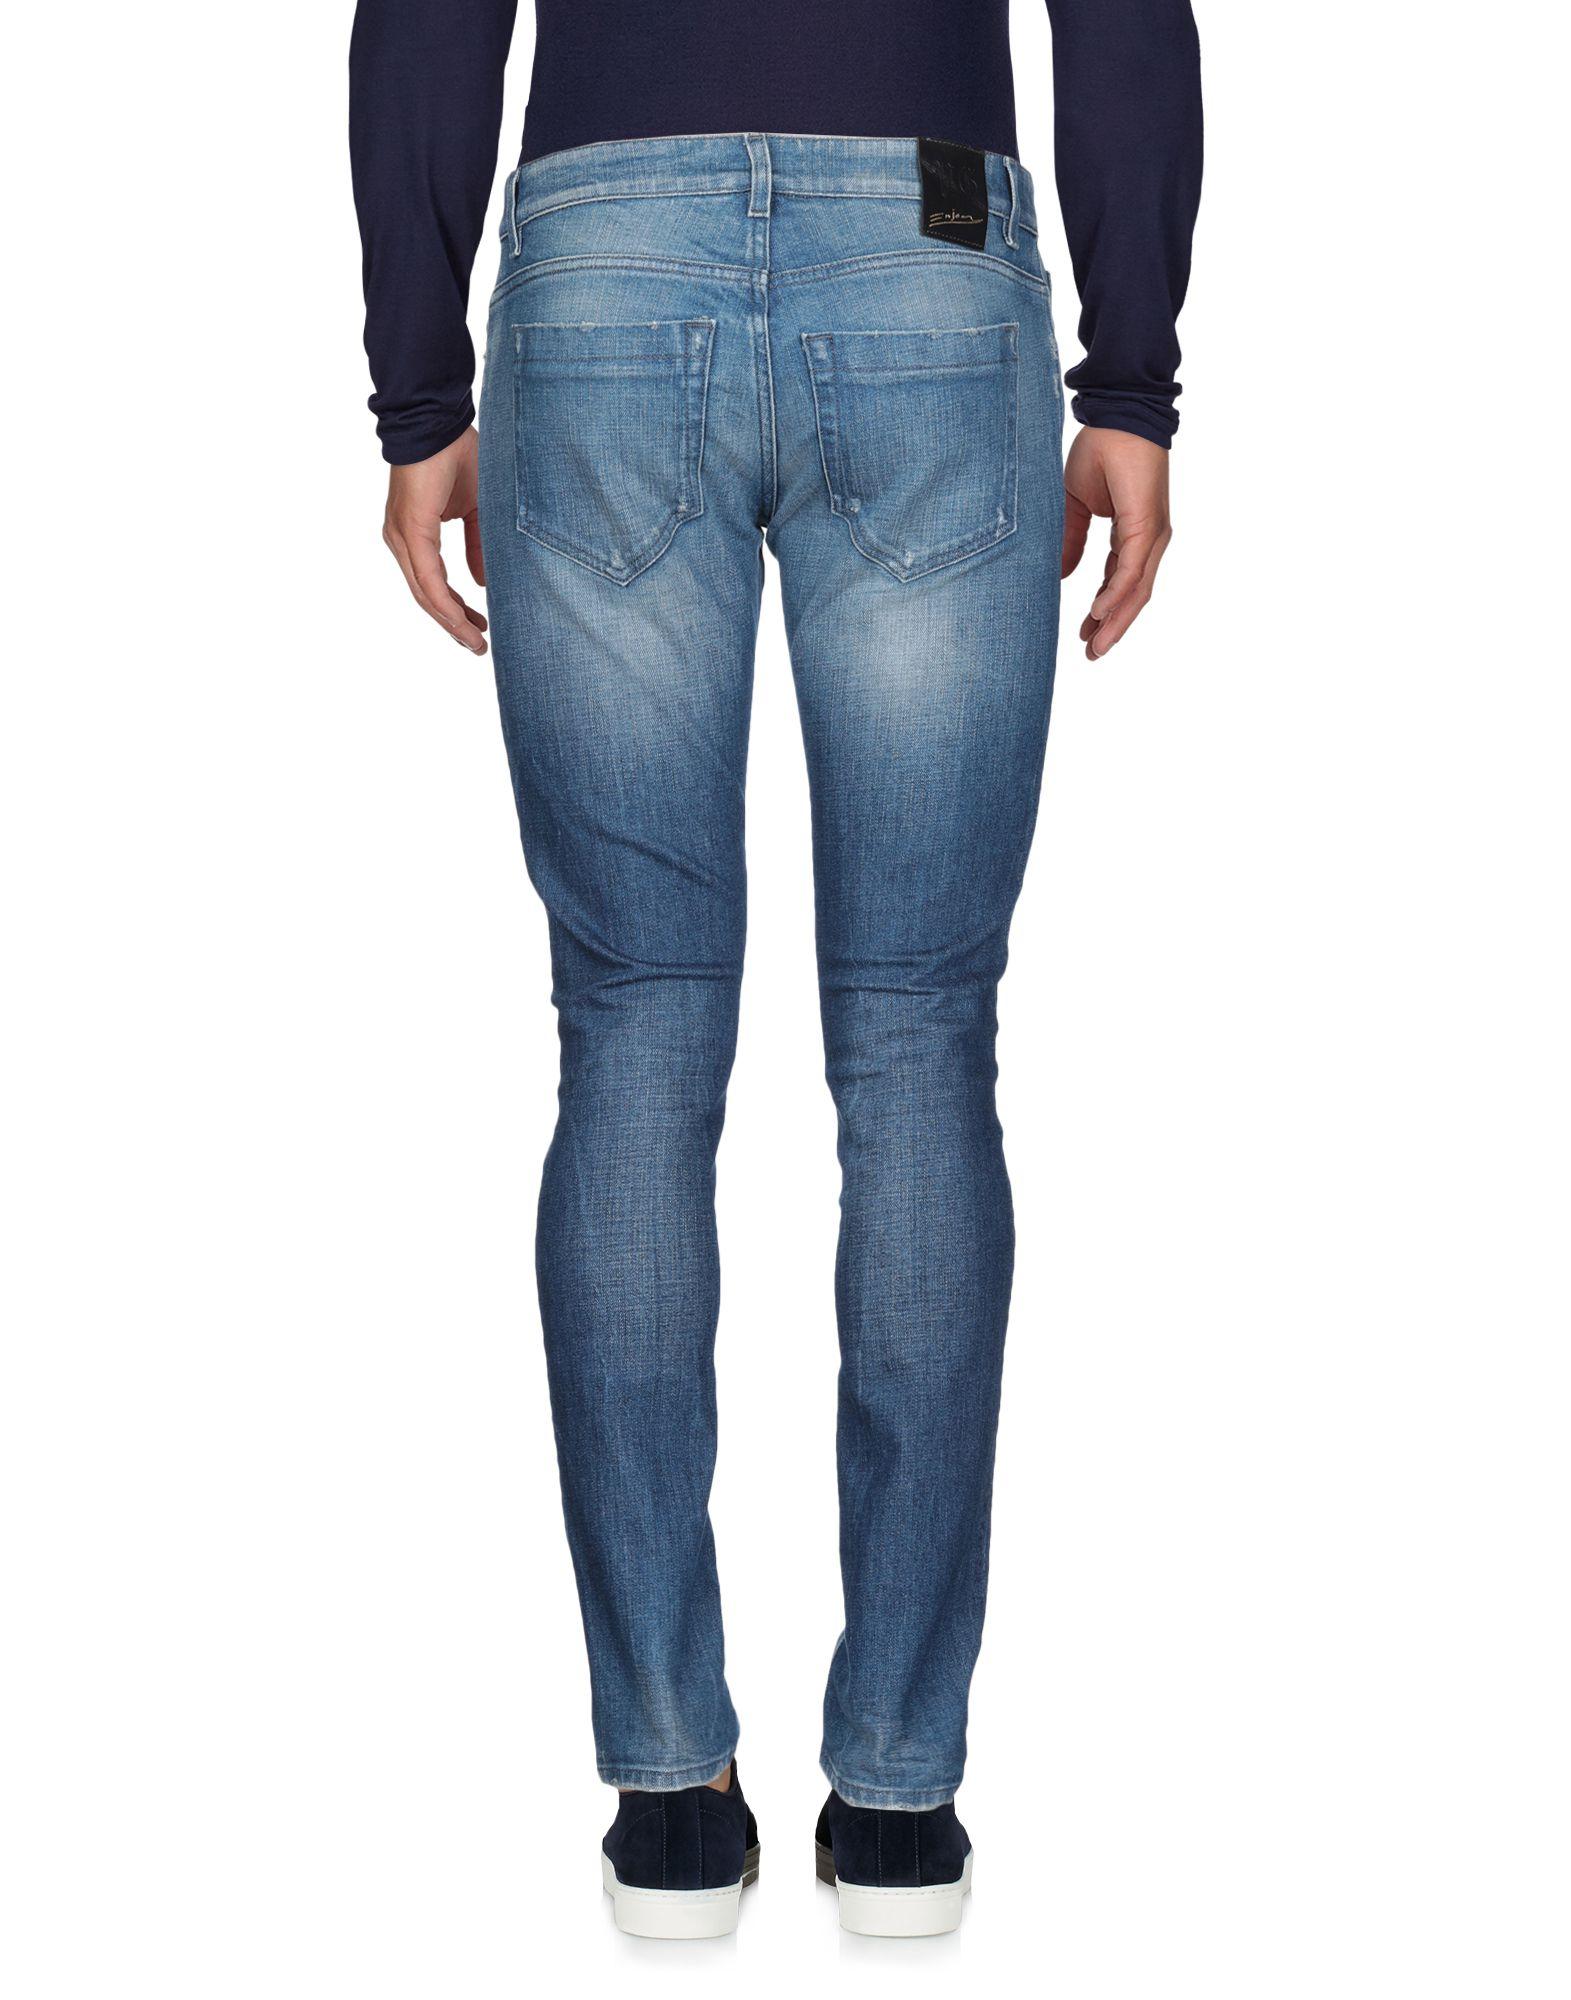 Pantaloni Jeans Pg Enjoy 42685880AD Uomo - 42685880AD Enjoy 309780